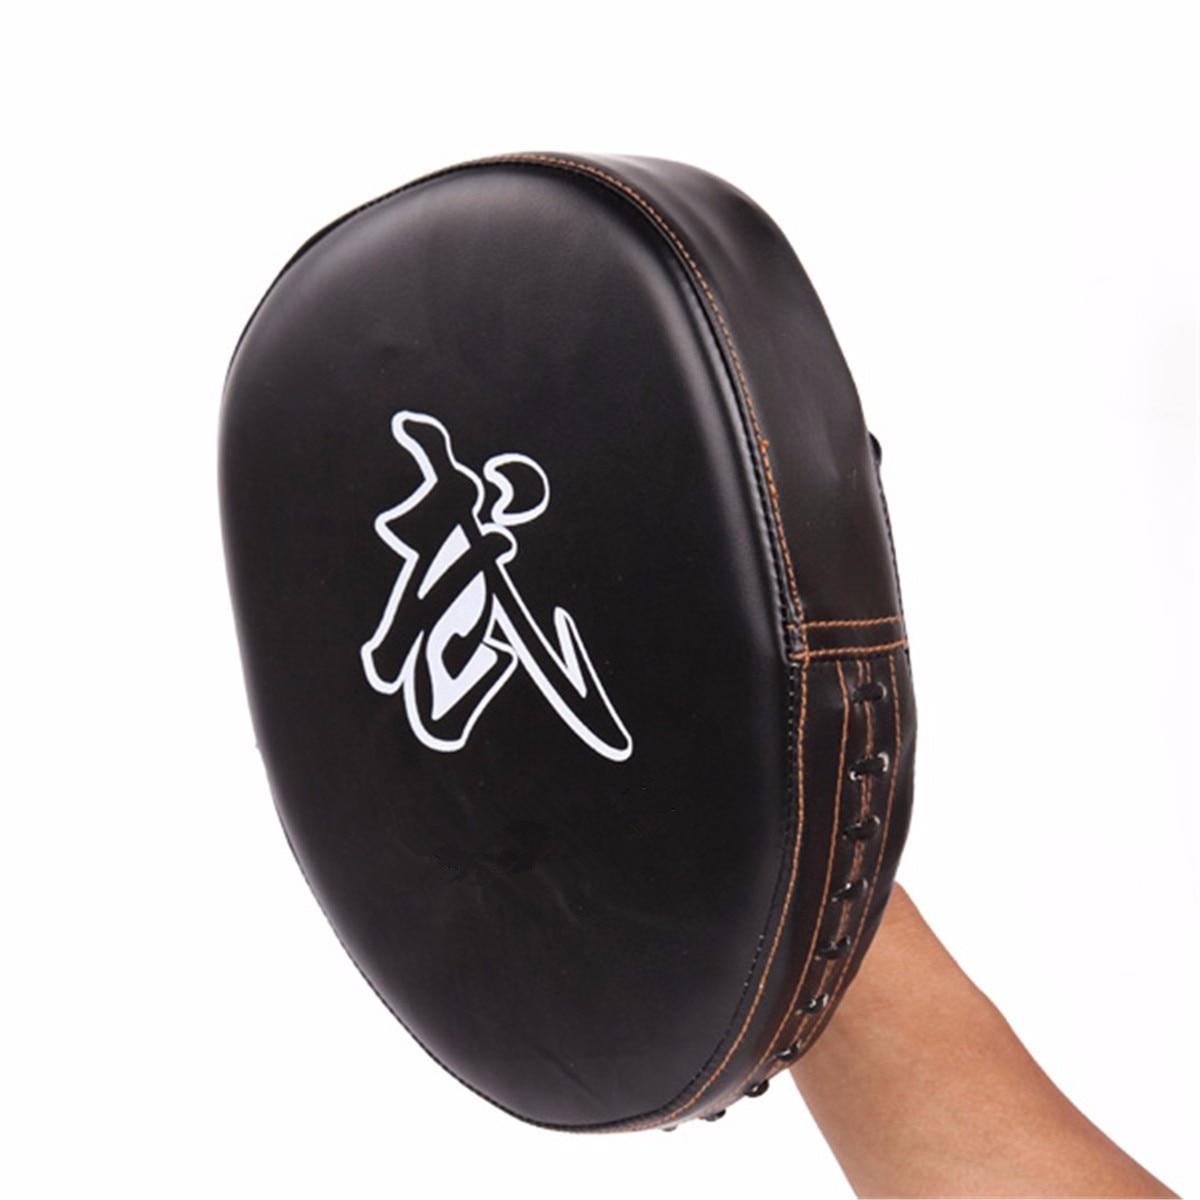 Black gloves at target - 1pcs Sports Boxing Gloves Pads For Muay Thai Kick Boxing Mitt Mma Training Pu Foam Boxer